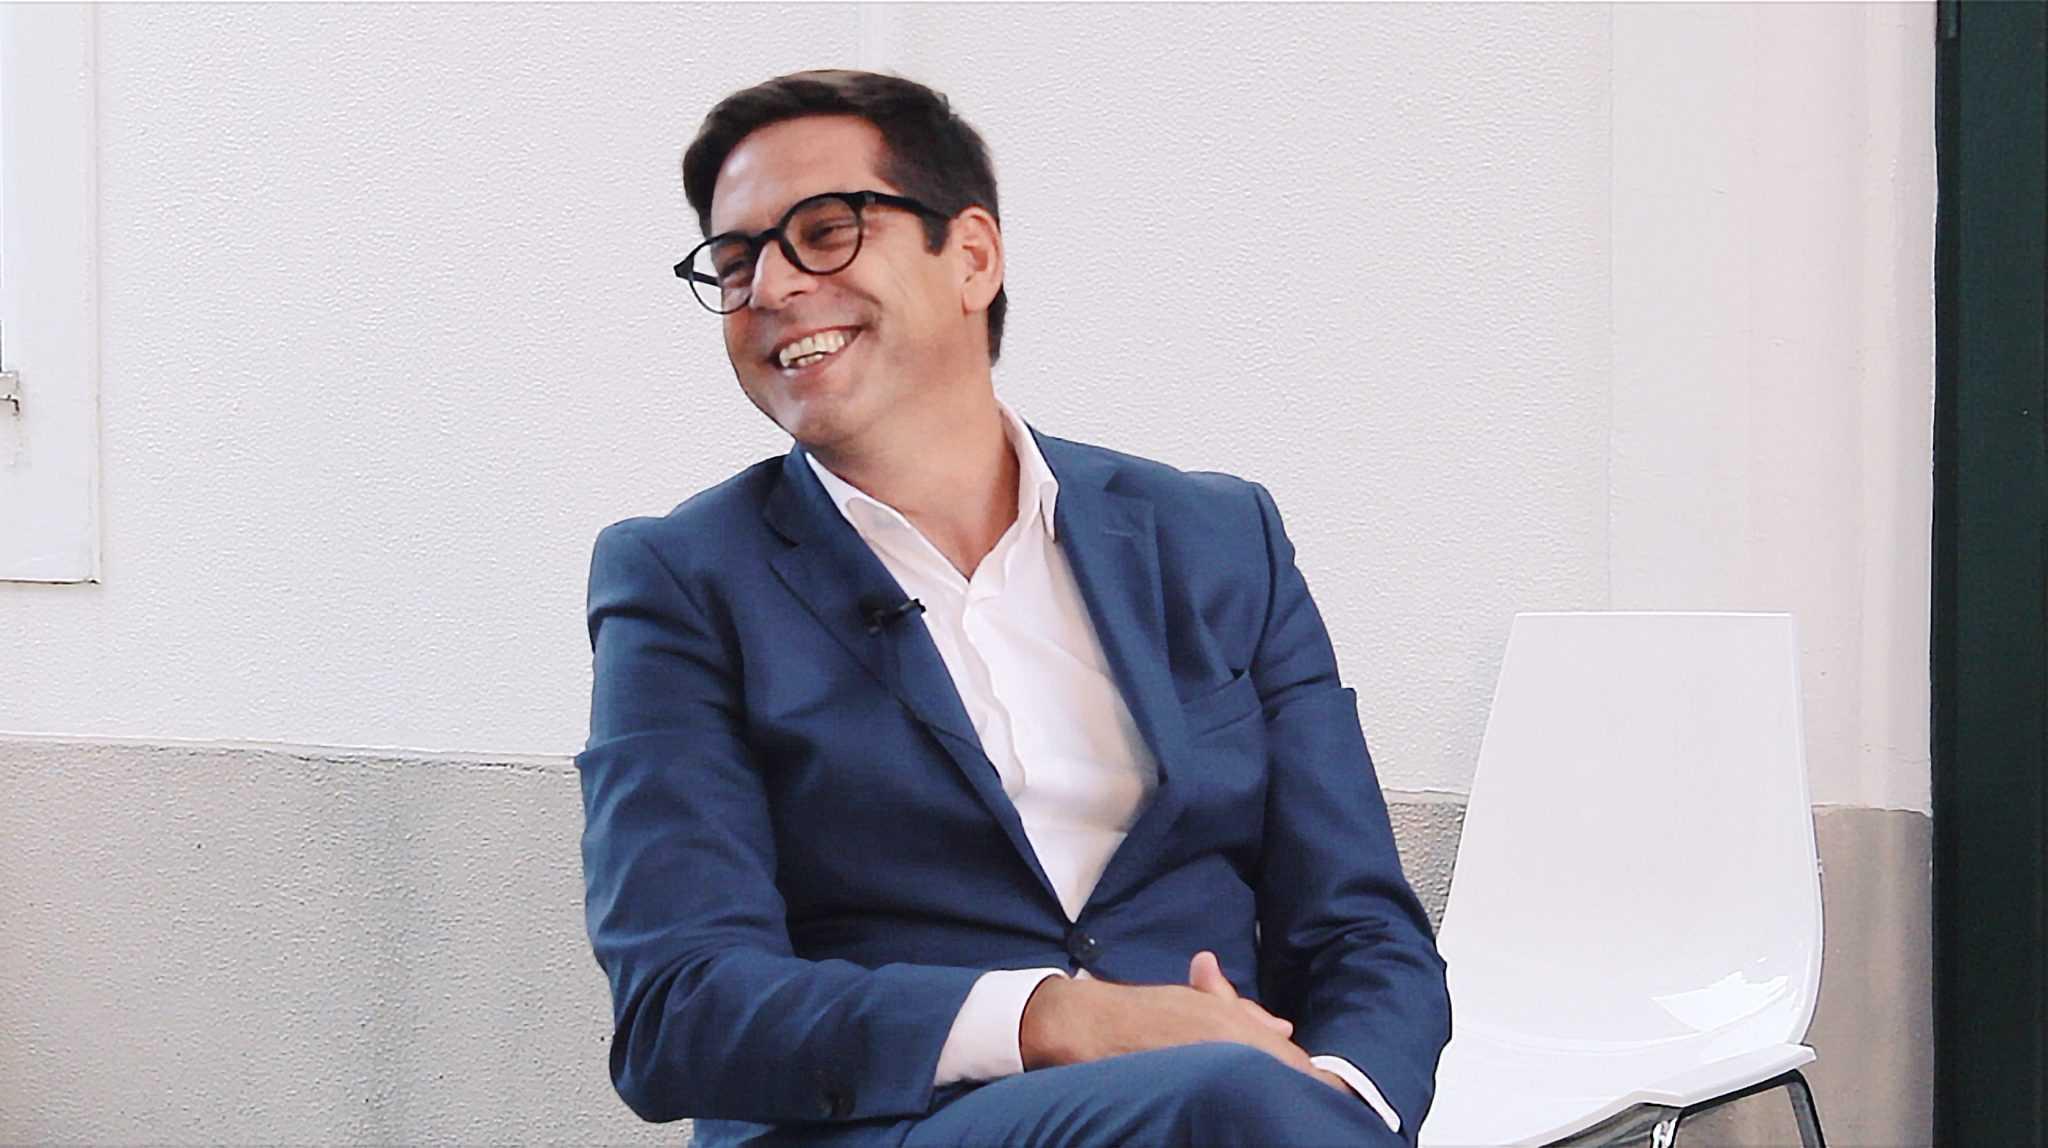 Tiago Forjaz